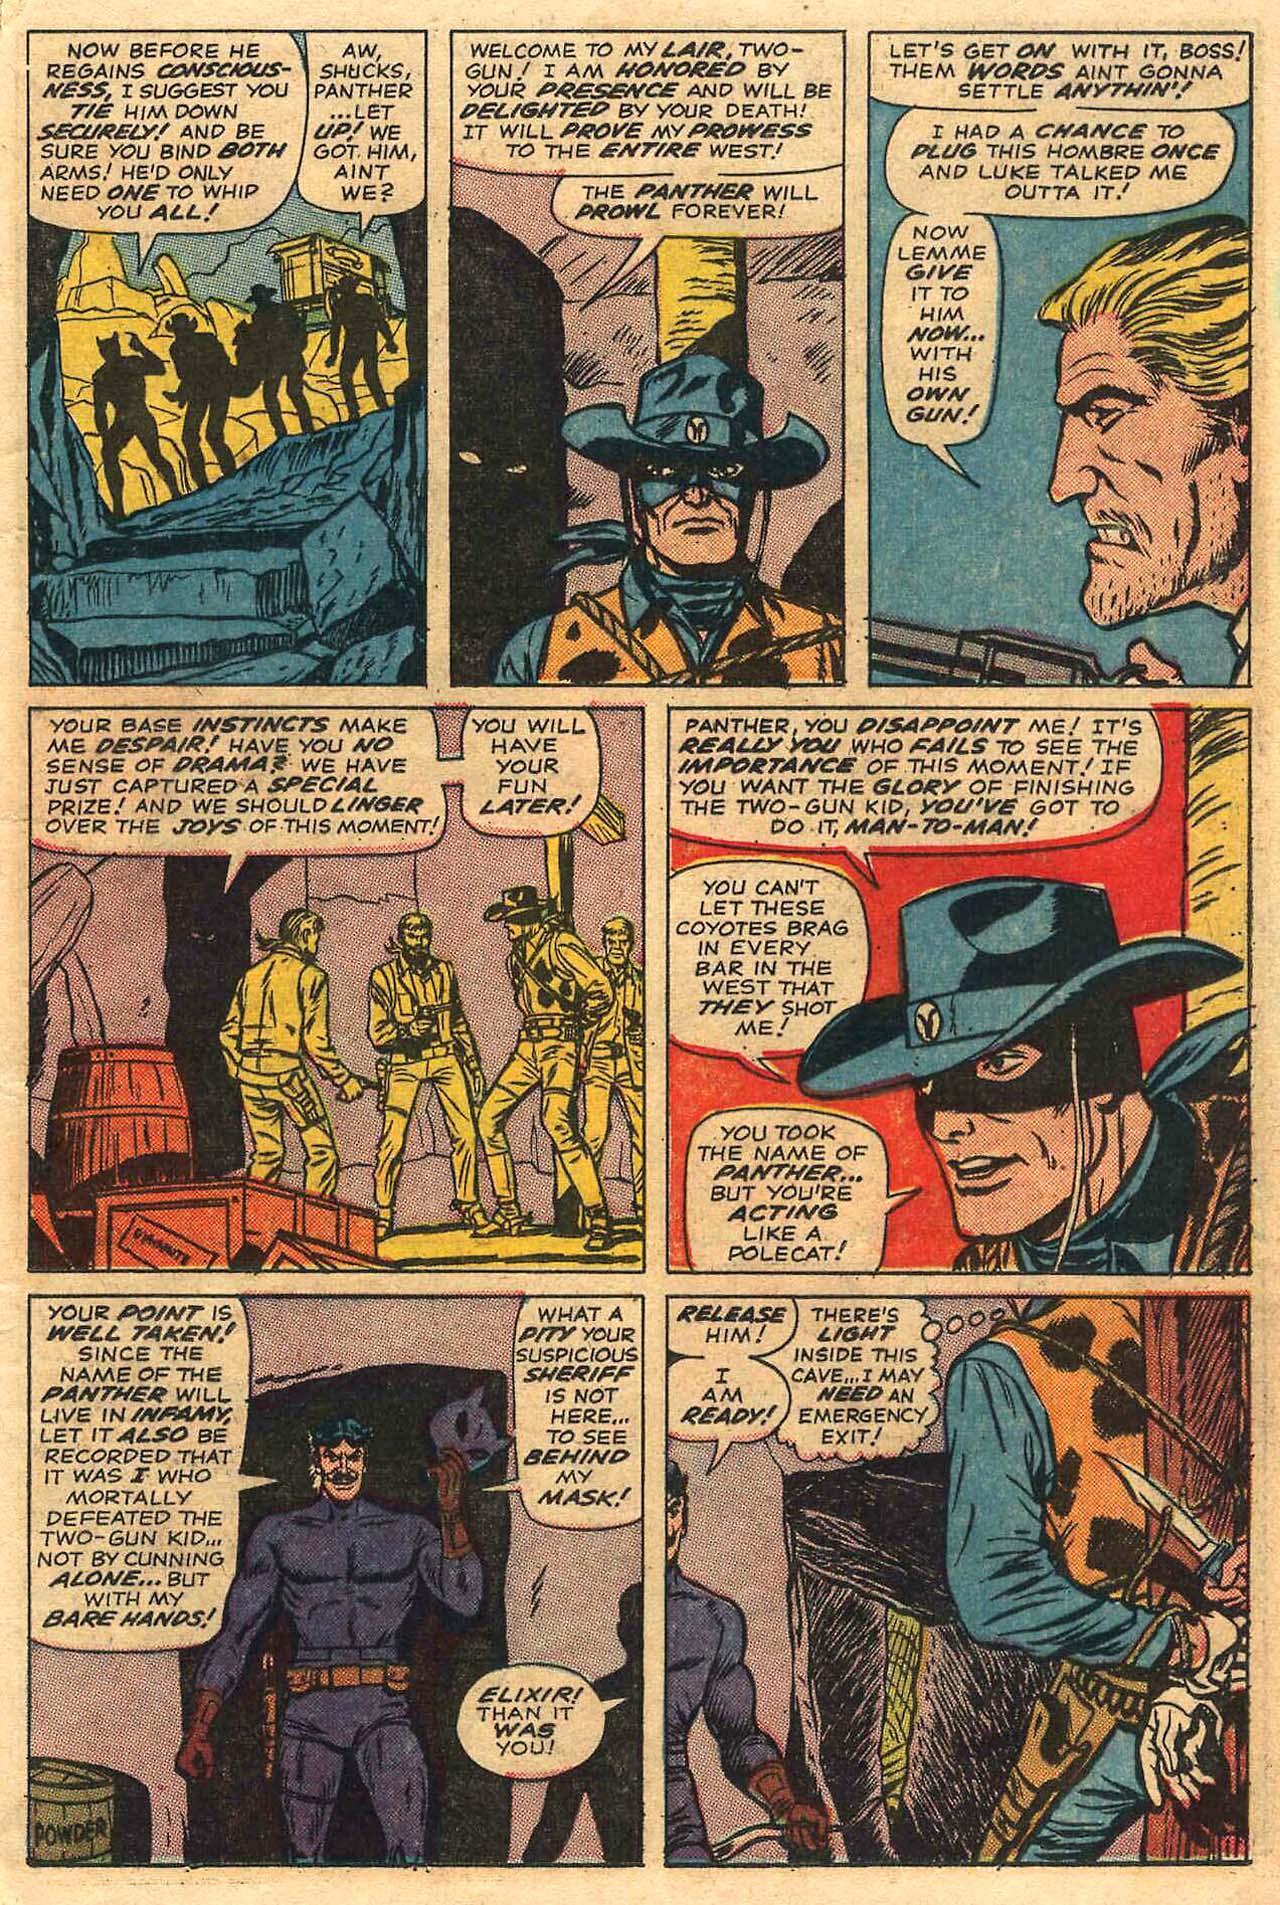 Read online Two-Gun Kid comic -  Issue #77 - 15